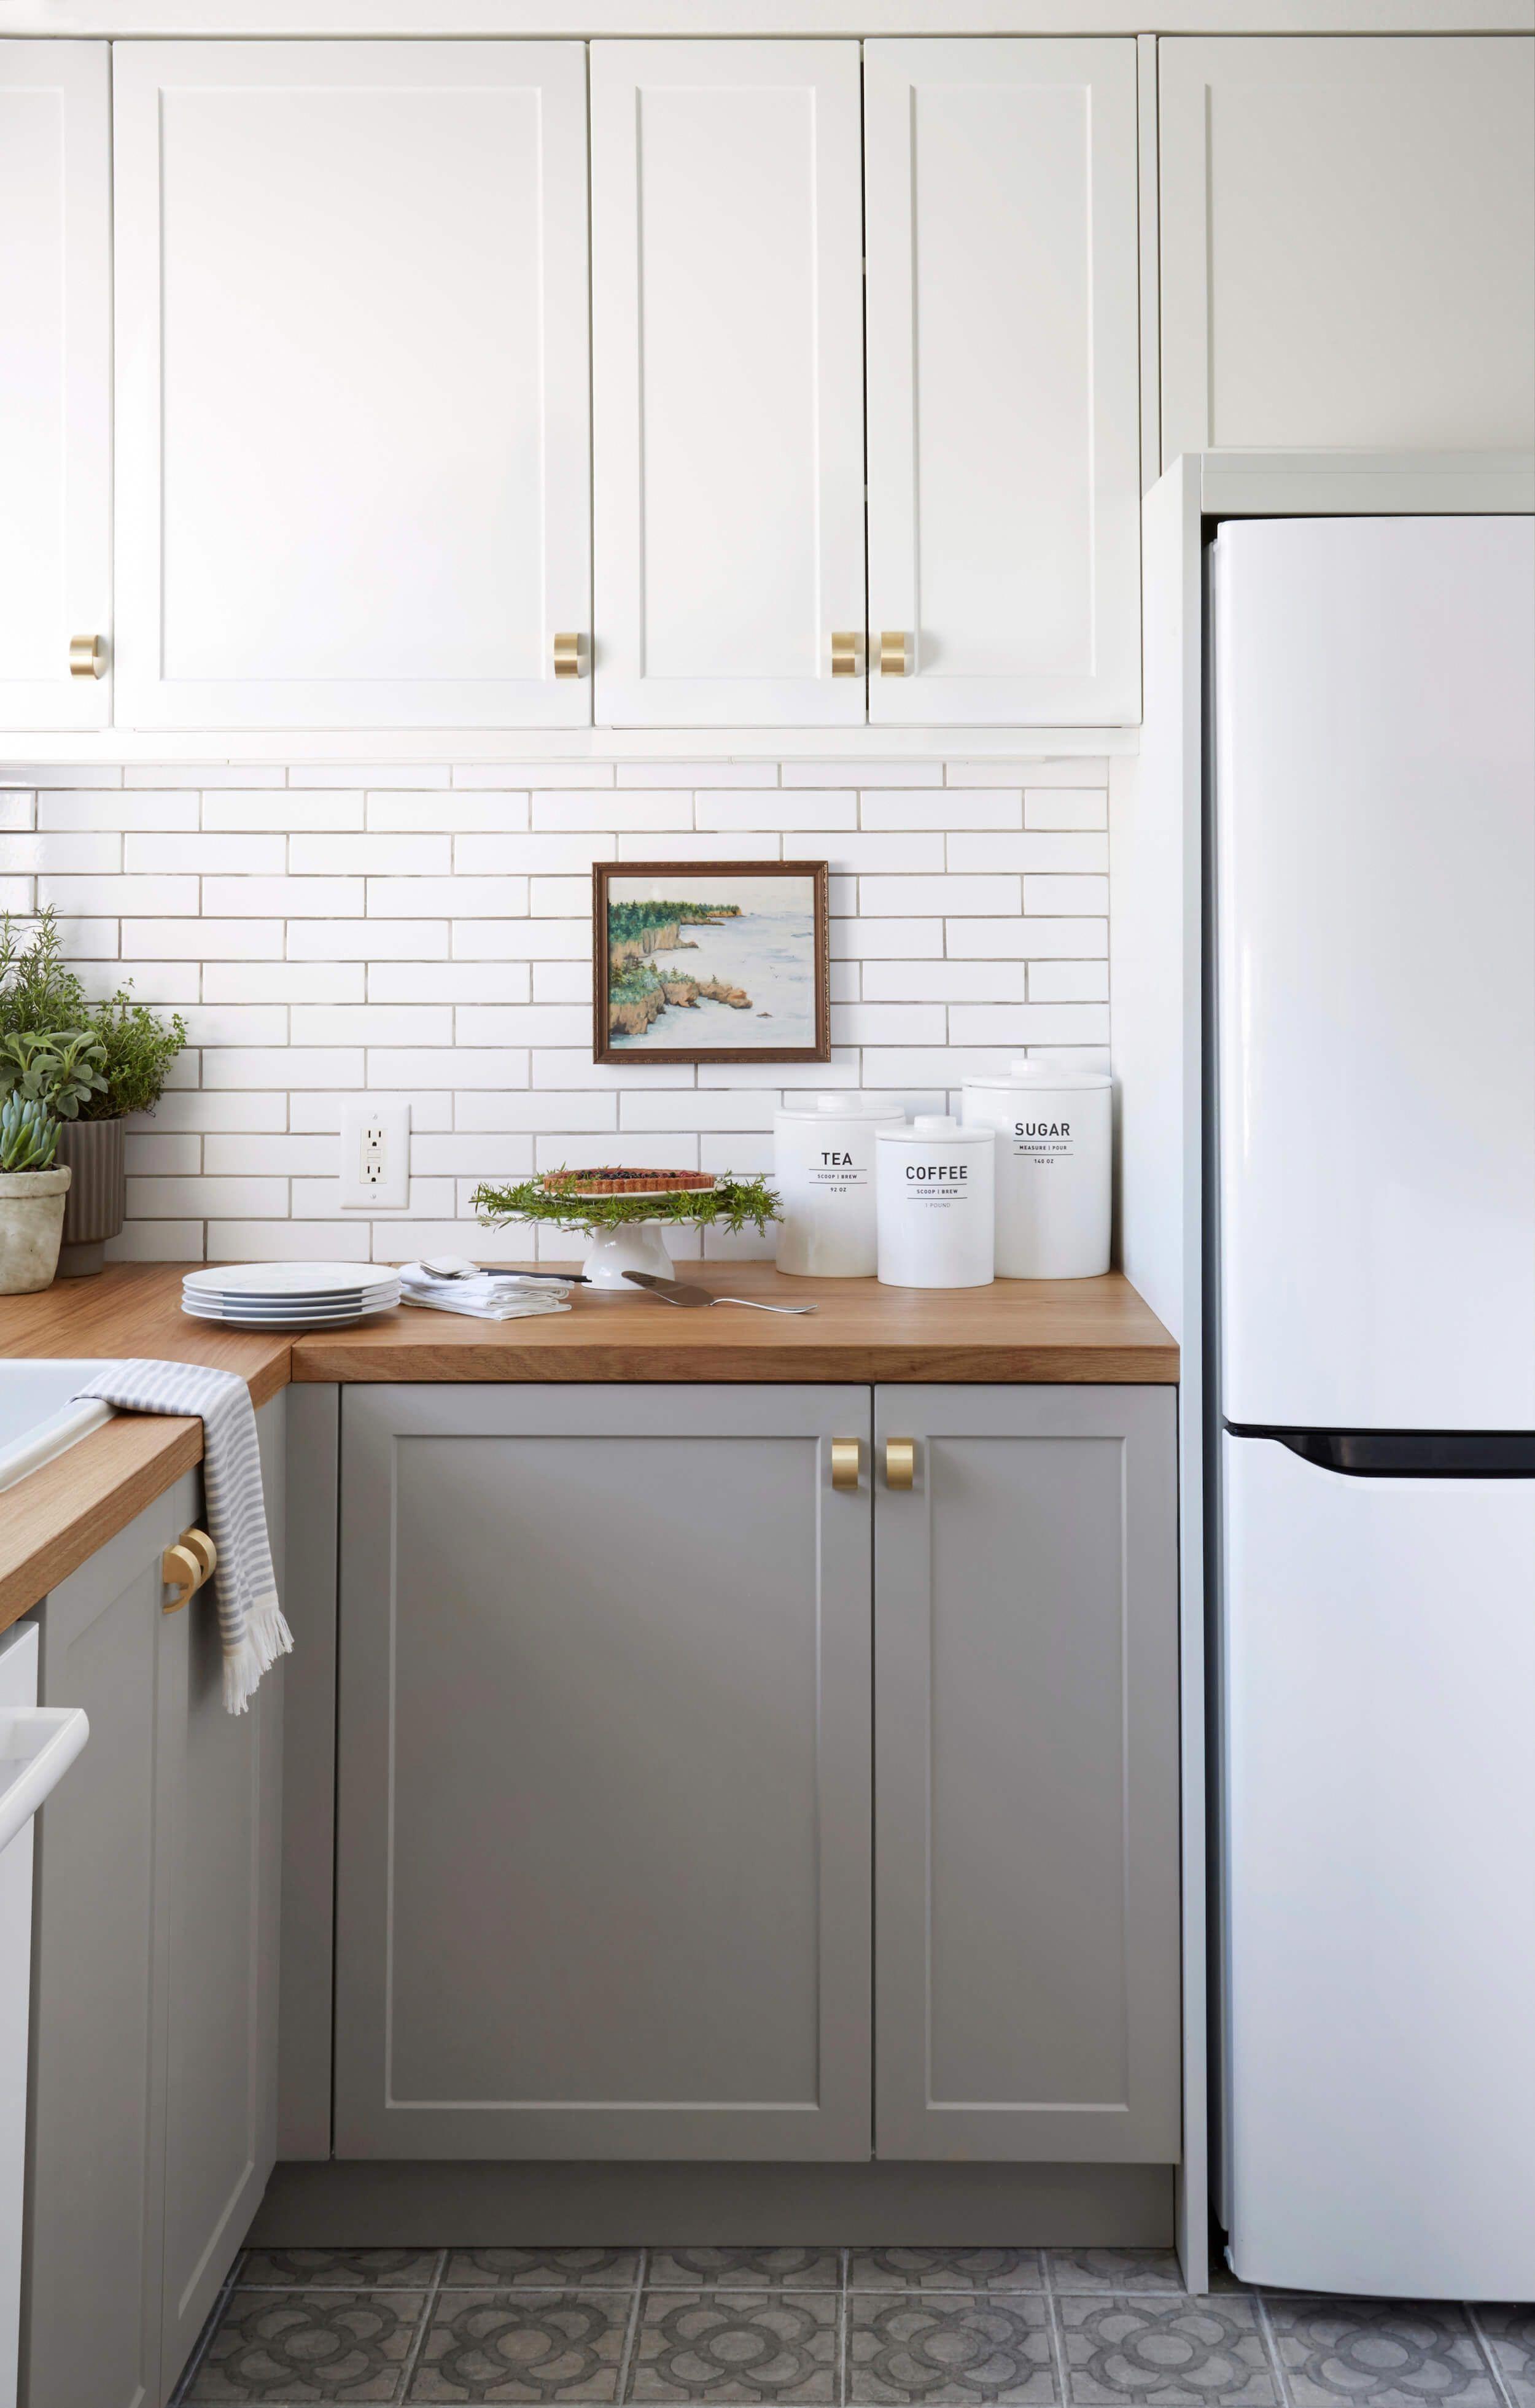 Orlandous kitchen reveal kitchenrenovationideas cook room